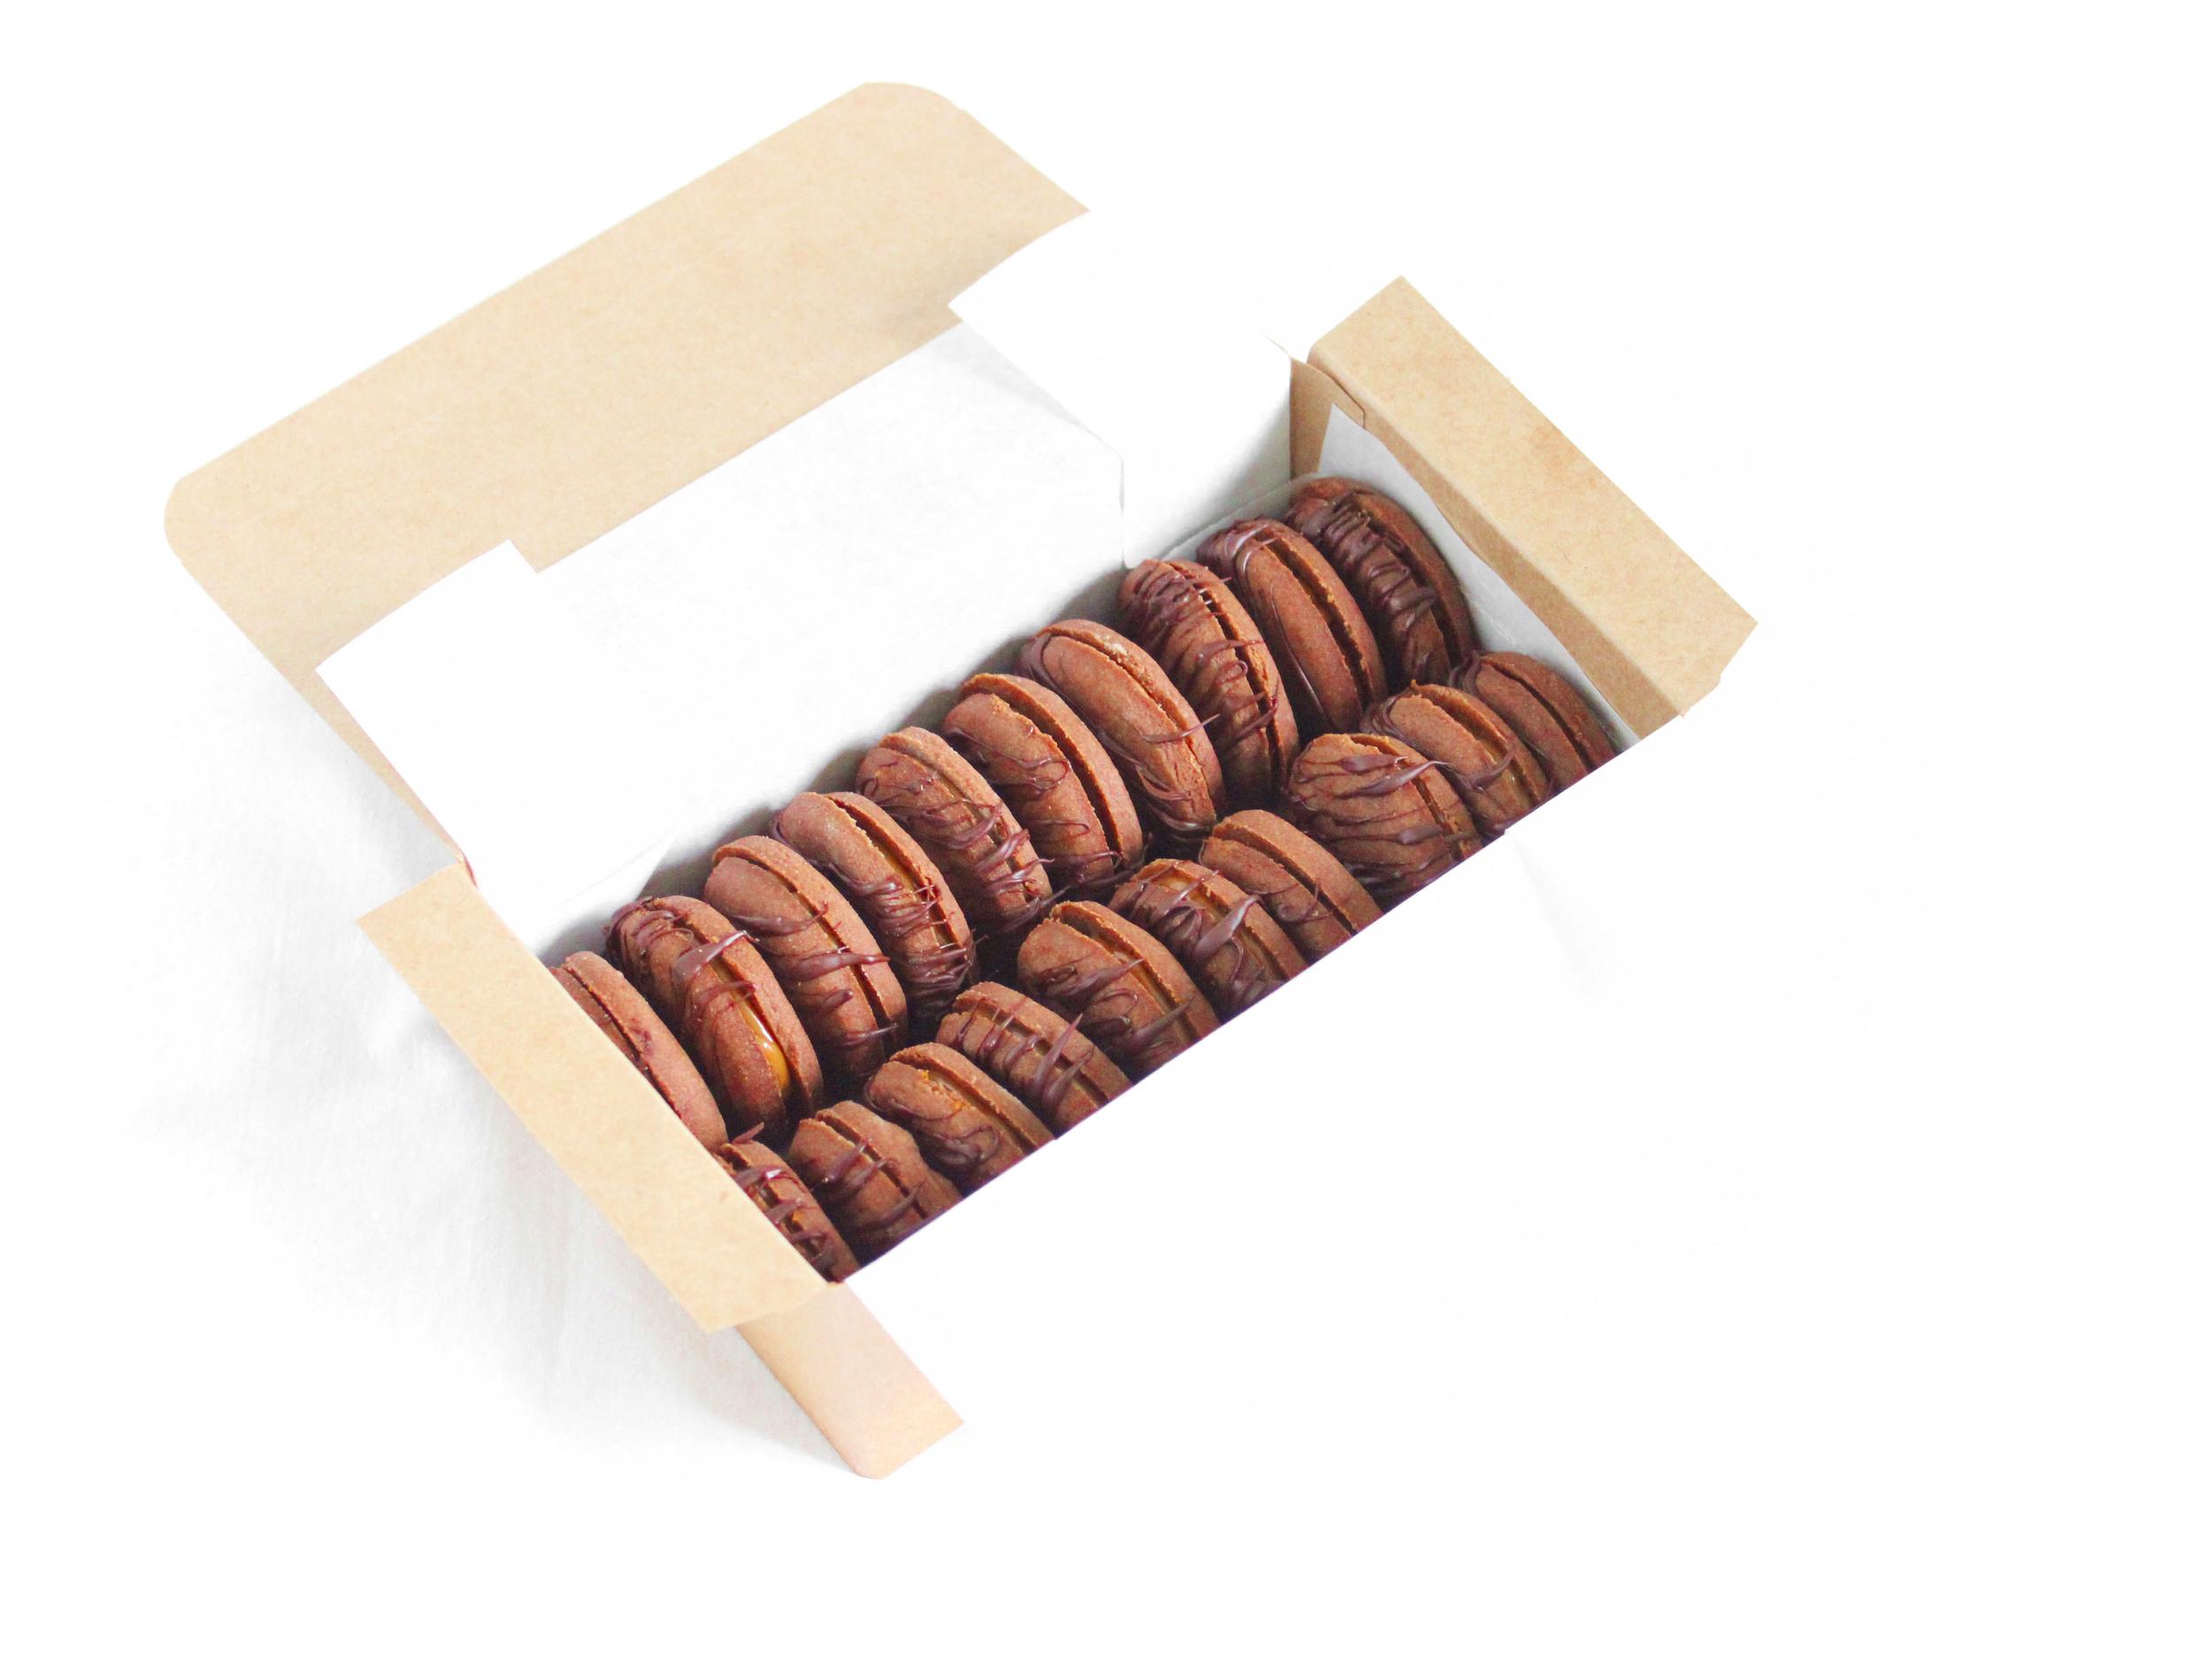 Coffret chocolat - 20 biscuits